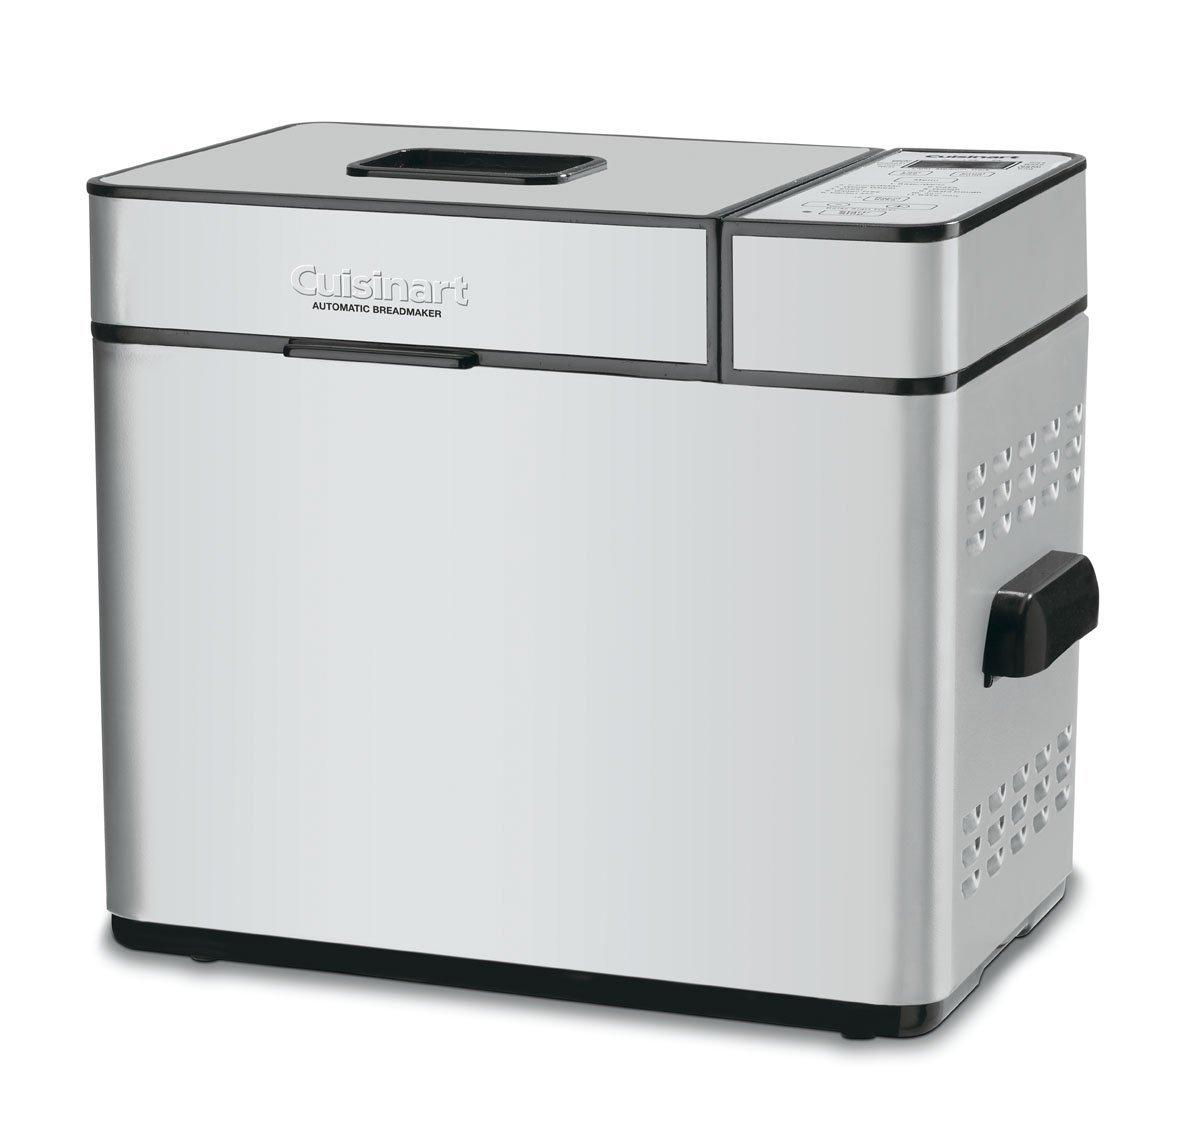 Cuisinart Bread machine